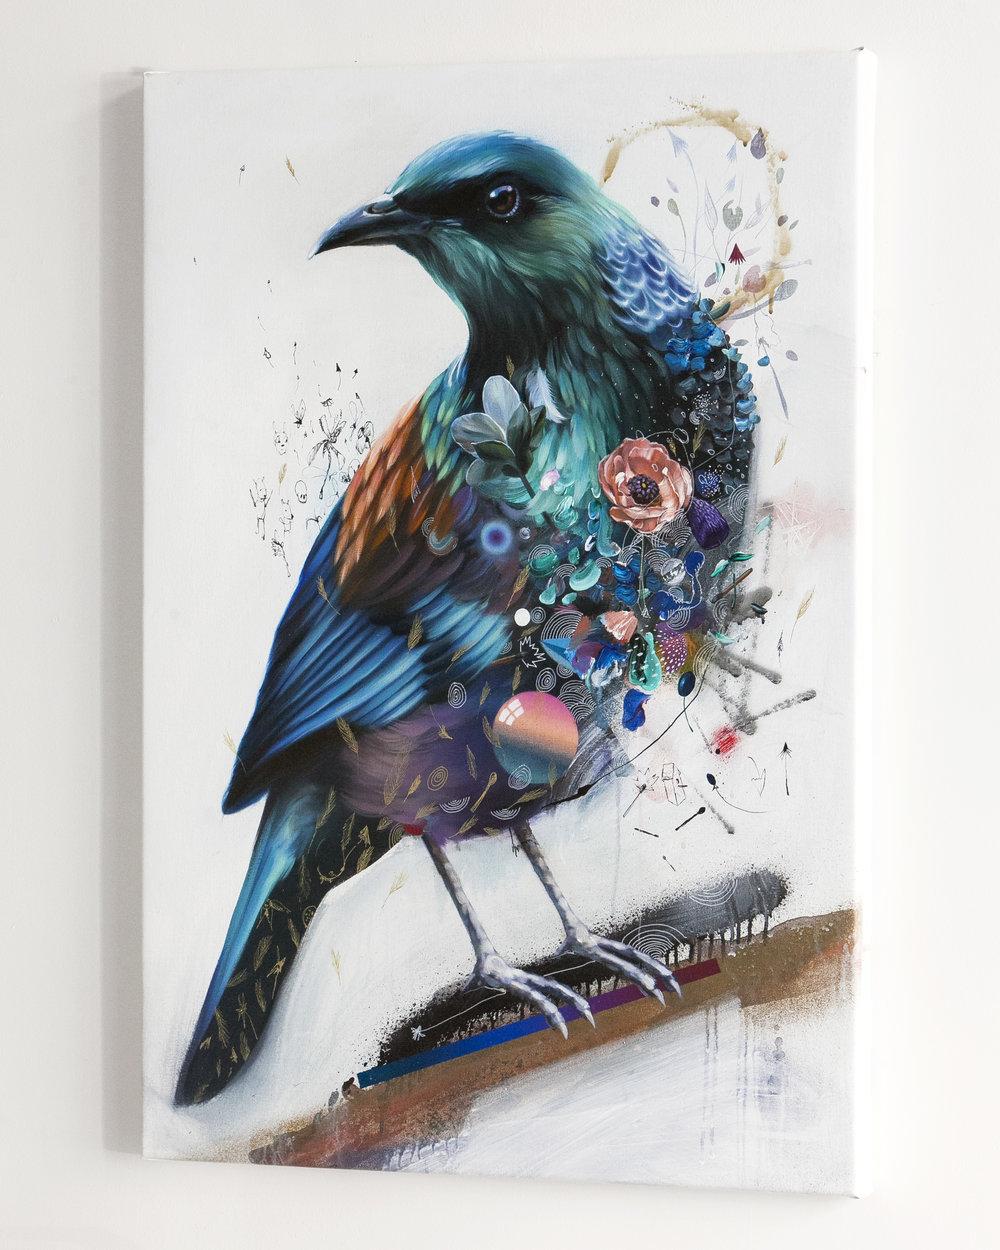 c_sa_bird7.jpg